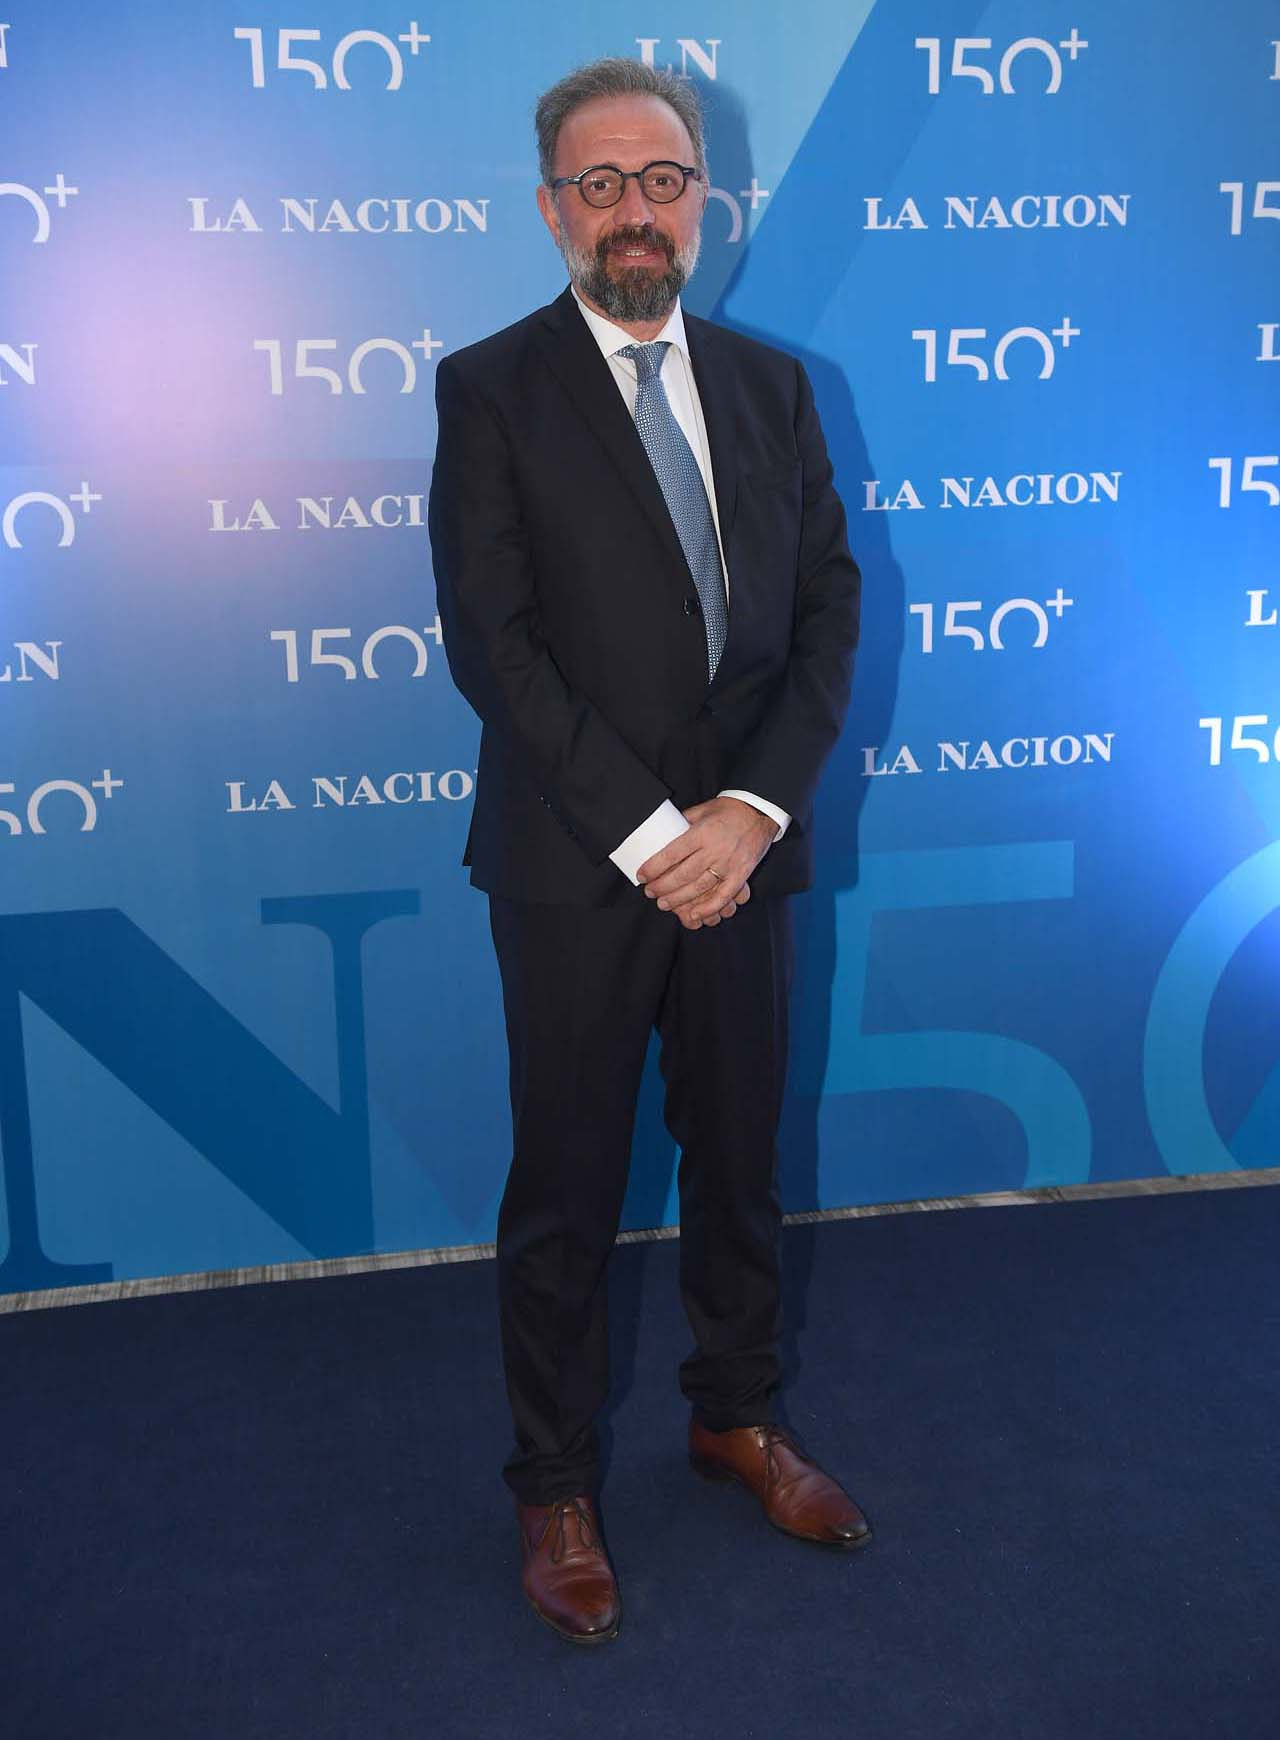 El ex presidente del Banco Provincia, Gustavo Marangoni